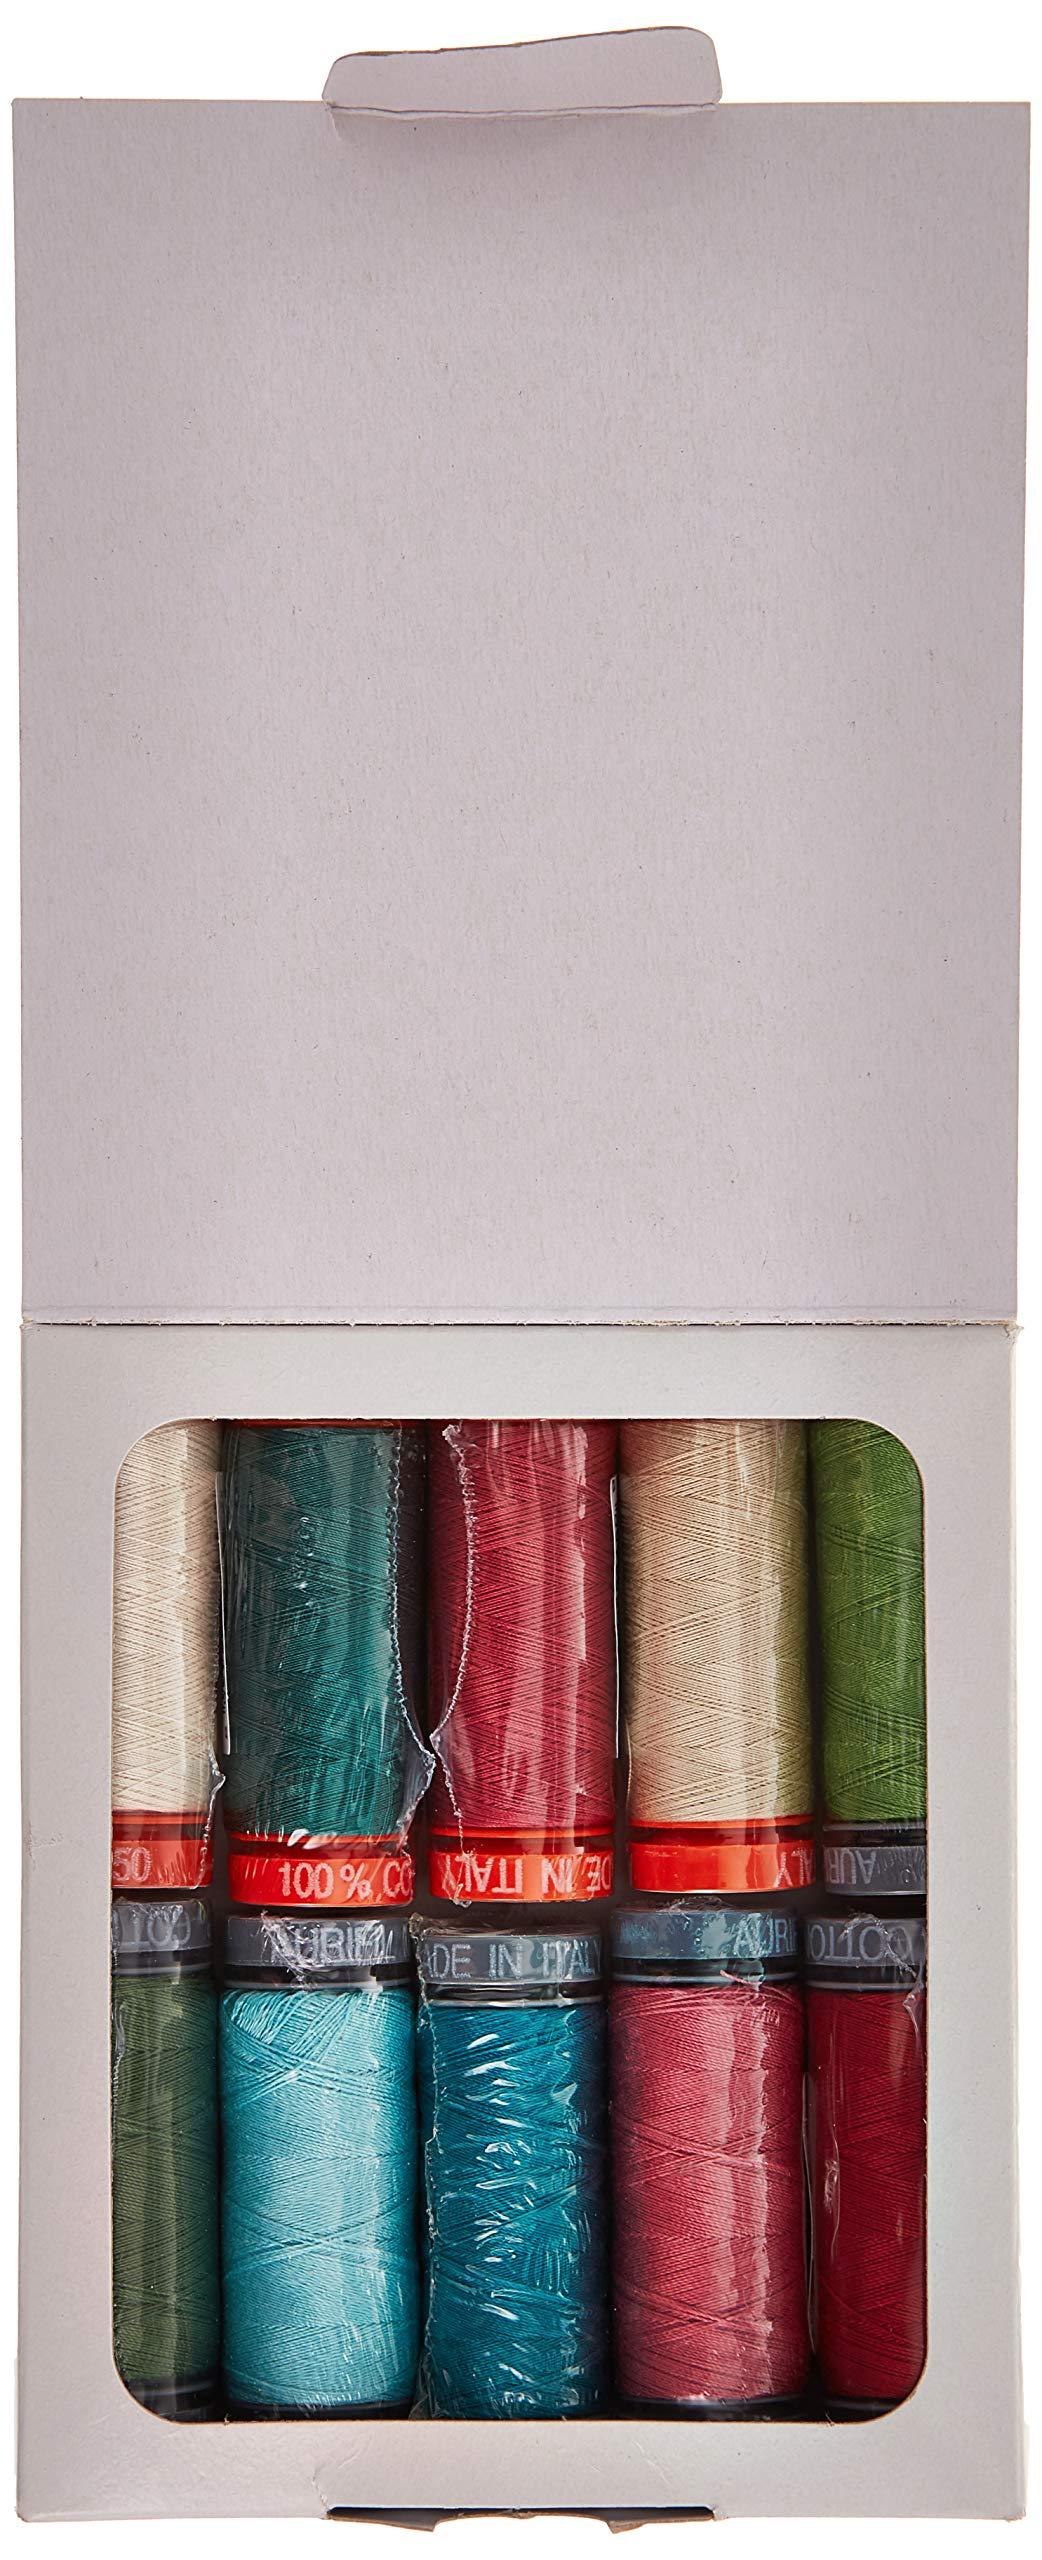 Nancy Rink Designs Painter's Garden Aurifil Thread Kit 5 50wt & 6 28wt Small Spools NR5028PG10 by Aurifil